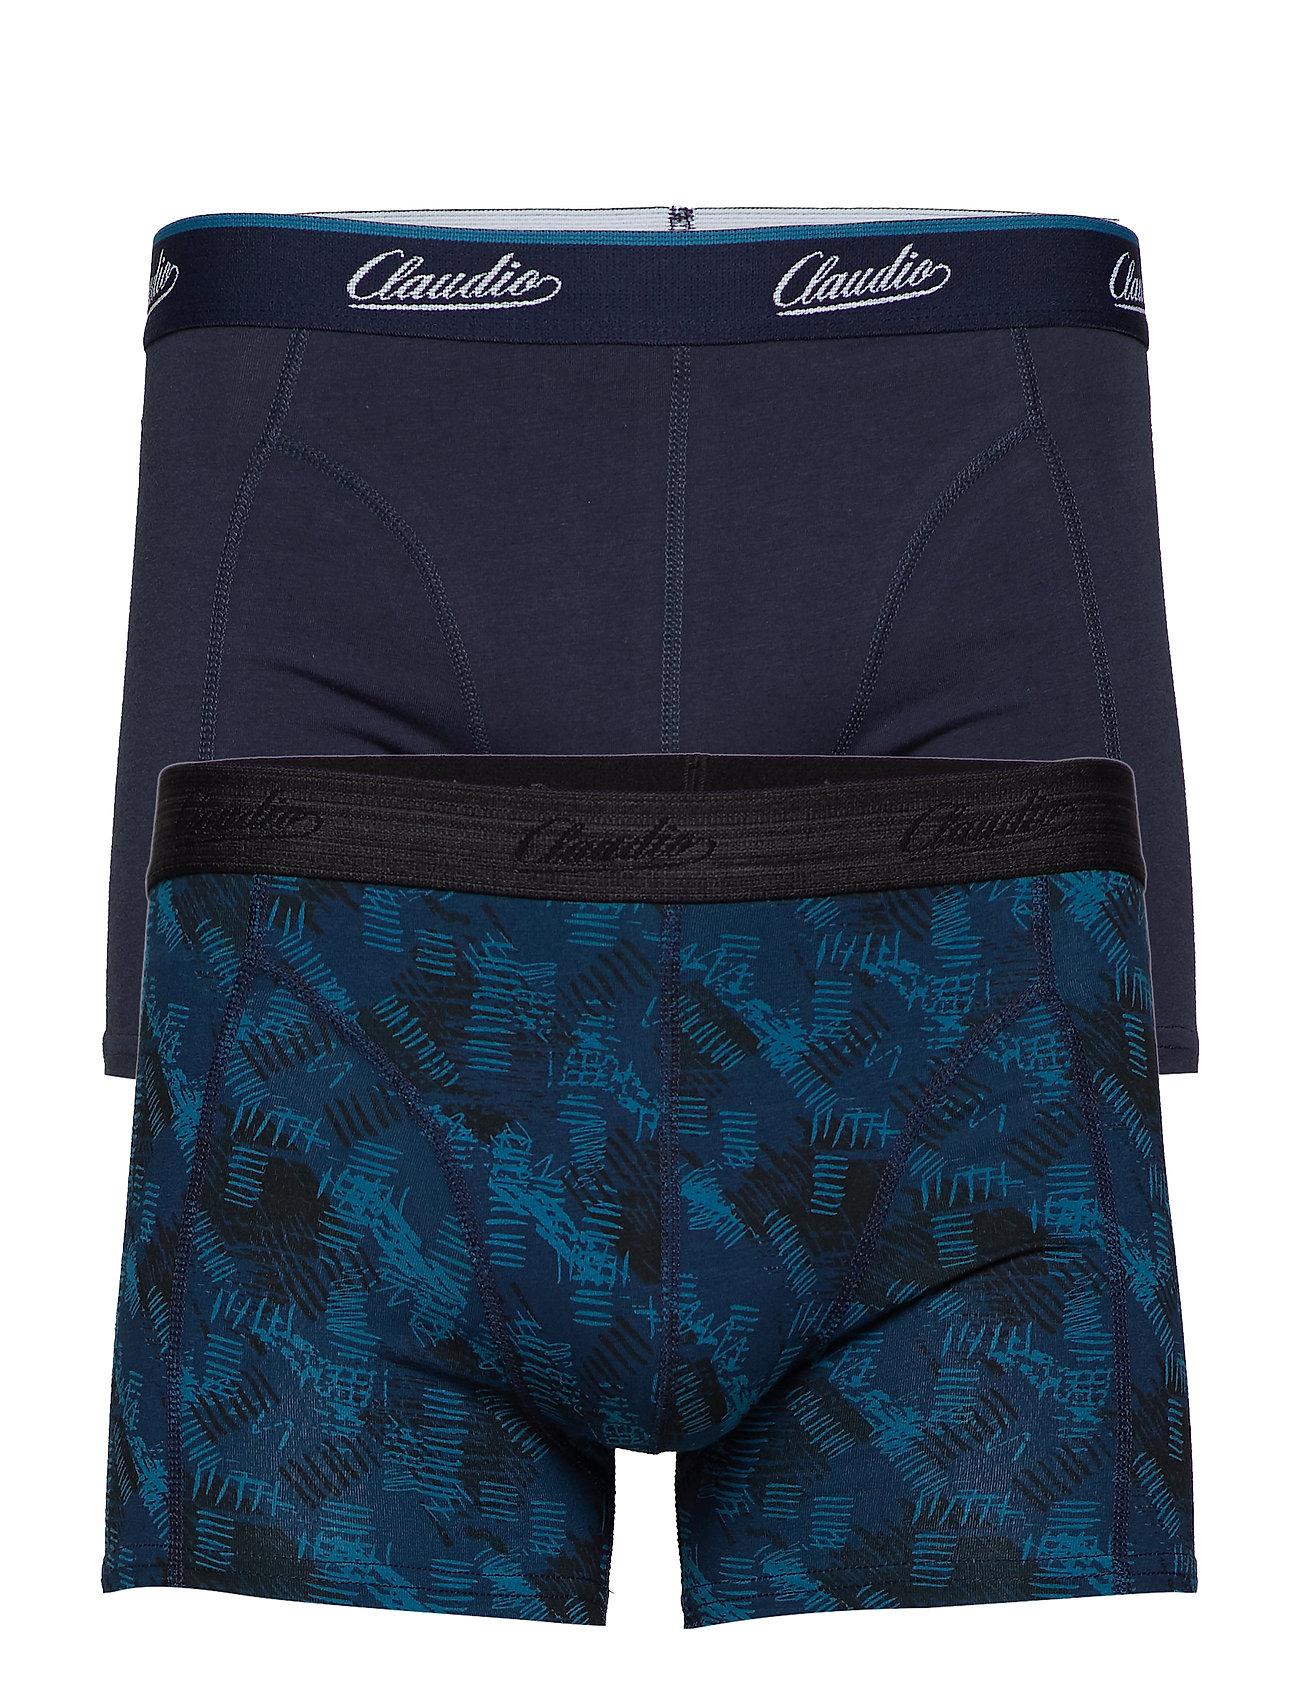 Claudio Claudio trunk 2-pack - NAVY+AOP